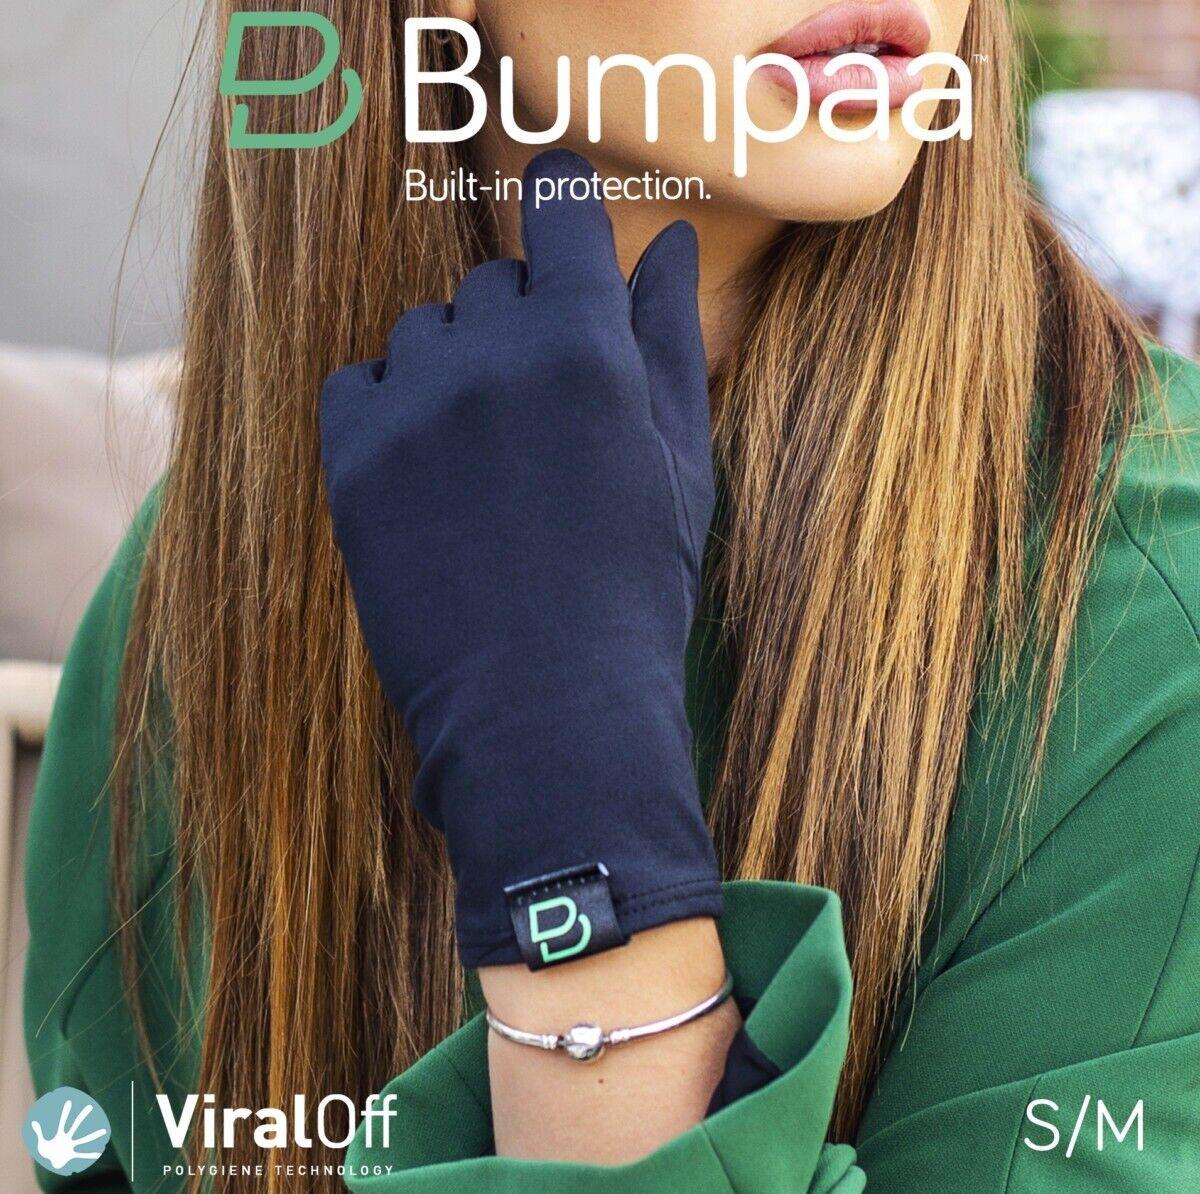 Bumpaa Female Everyday Gloves (S/M)